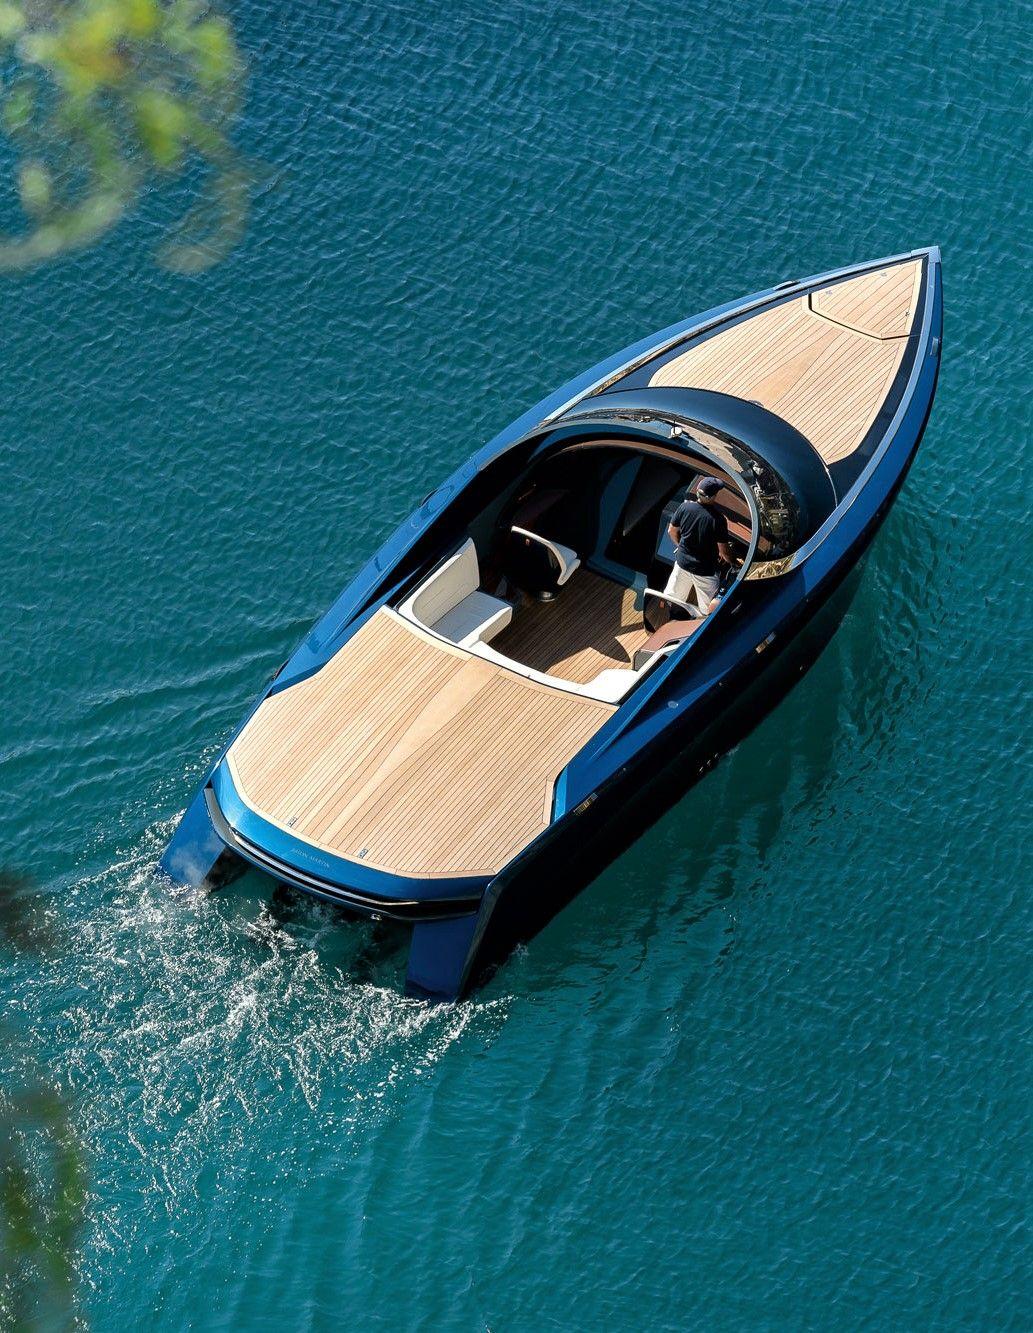 52 Speed Boats Ideas Speed Boats Power Boats Fast Boats